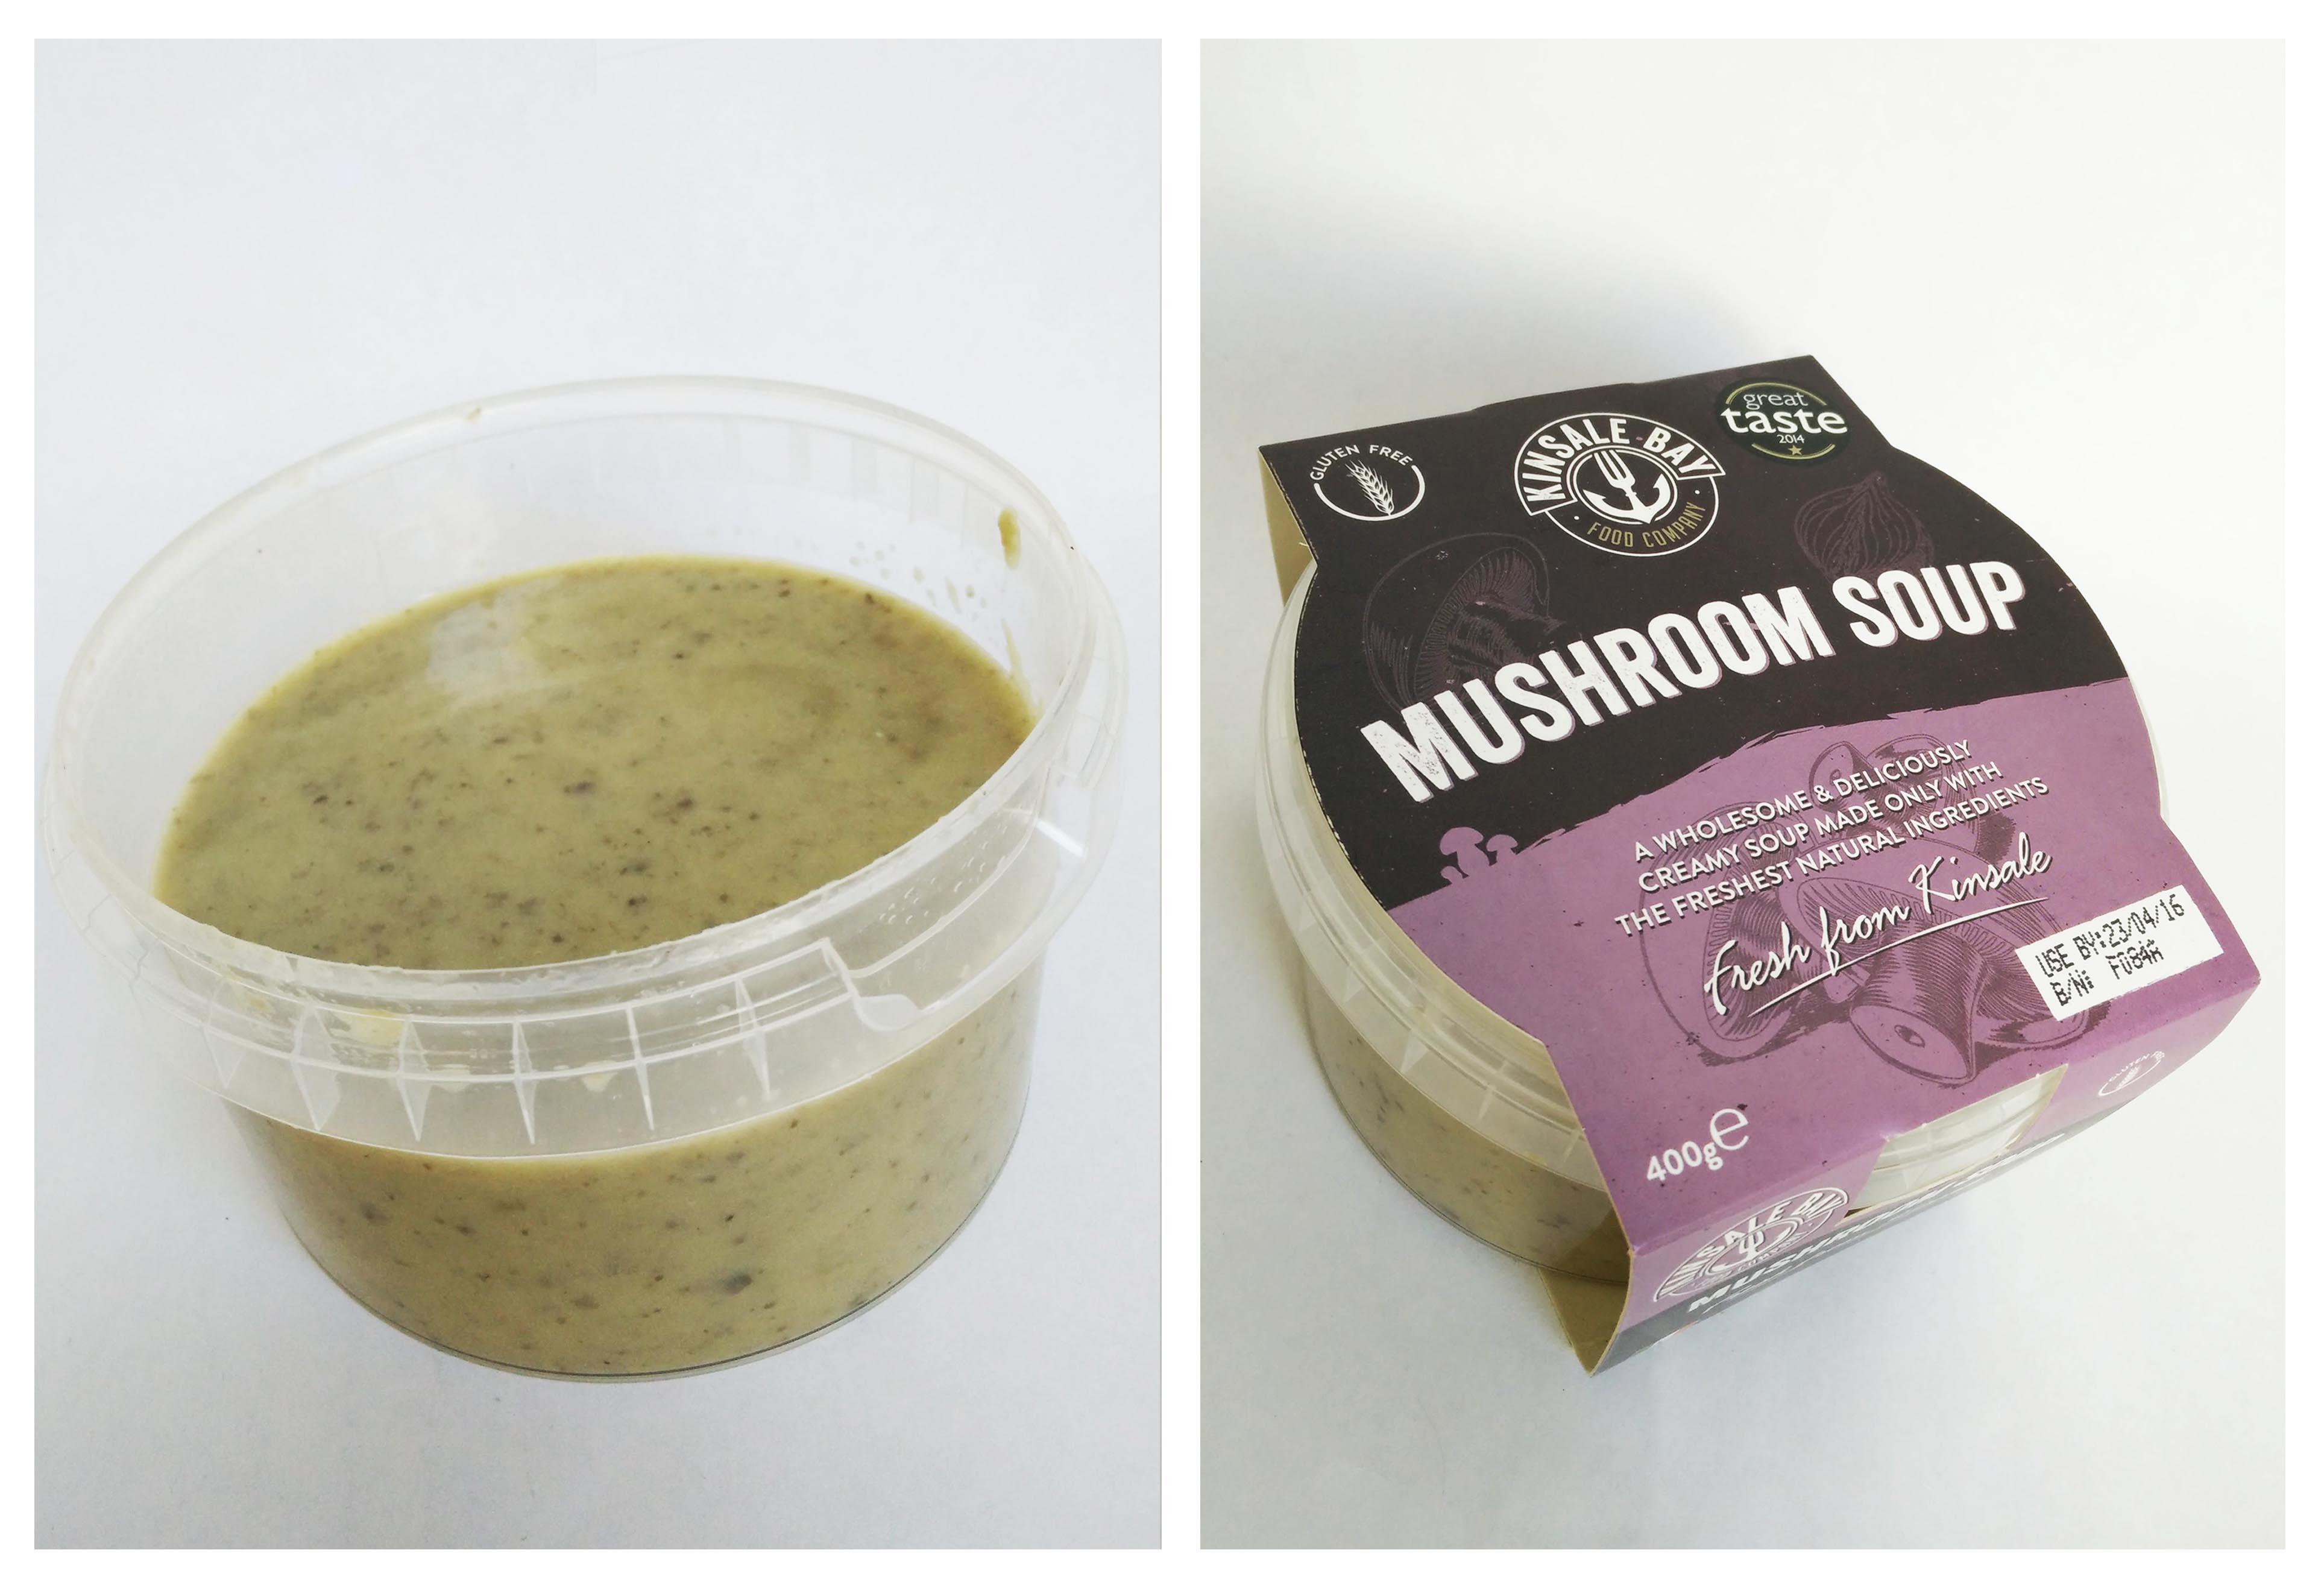 #fridayfinds - Kinsale Bay Food Company Mushroom Soup